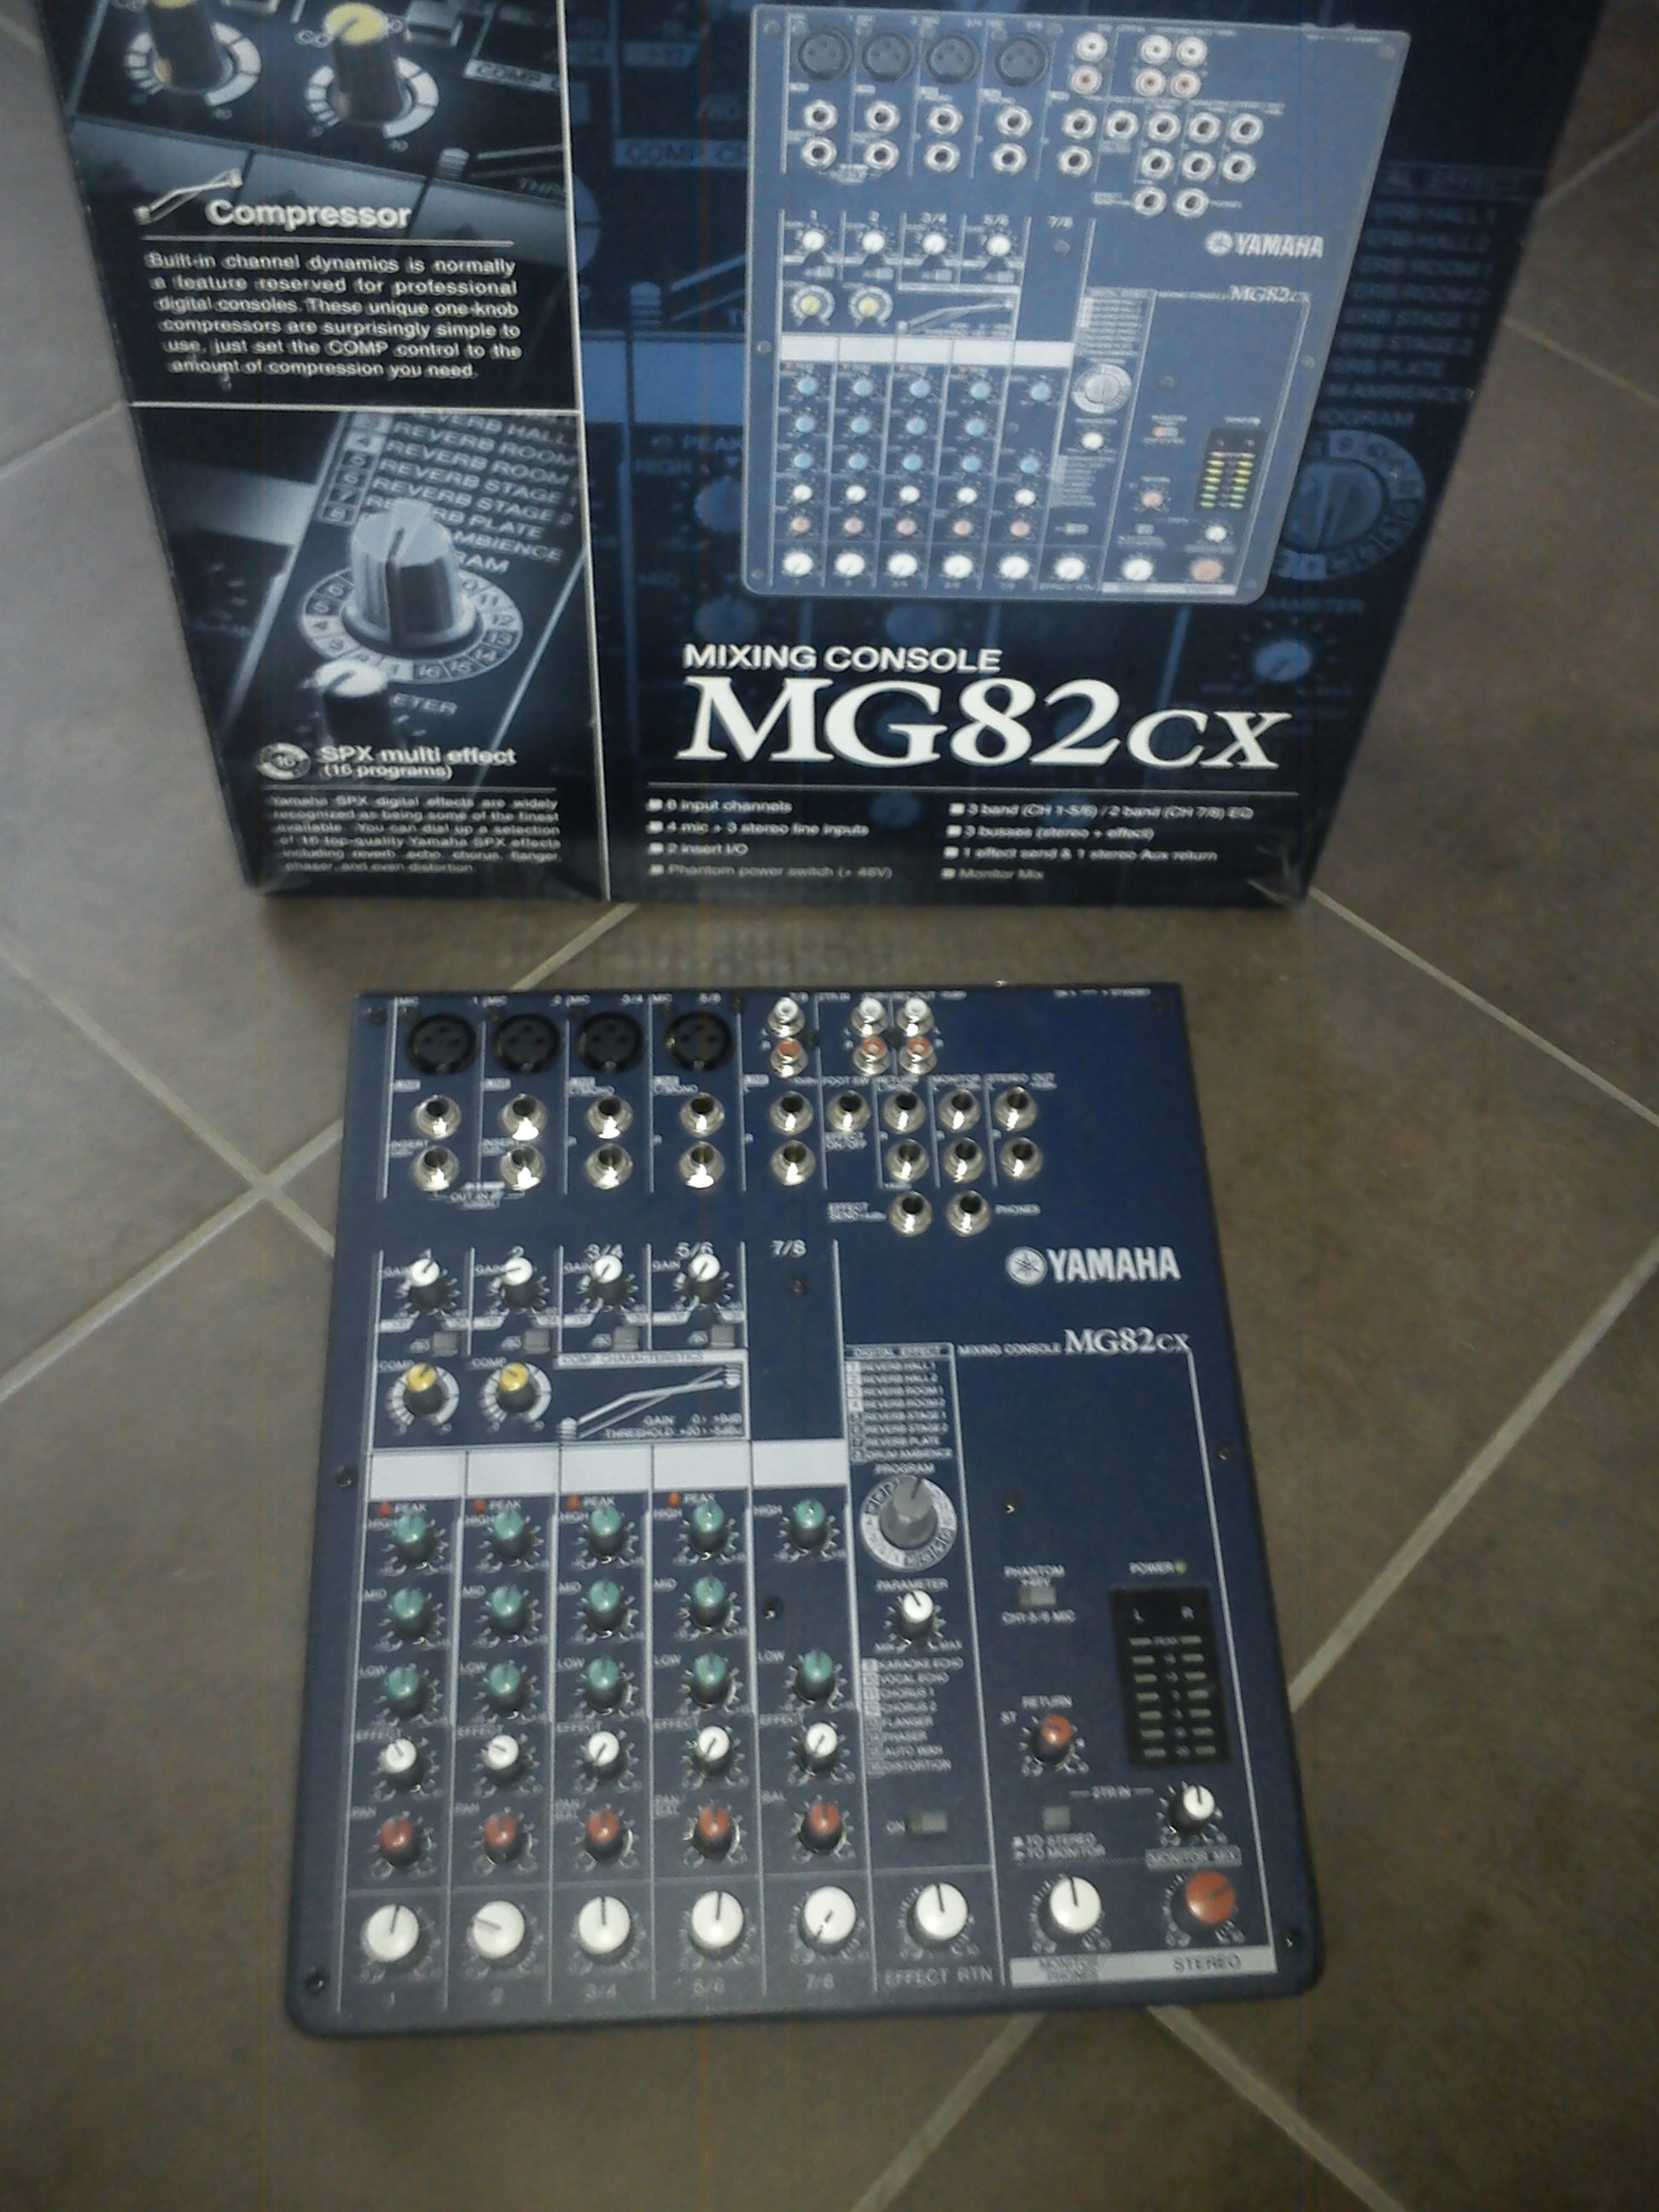 Yamaha Mixing Console Mg Cx Manual